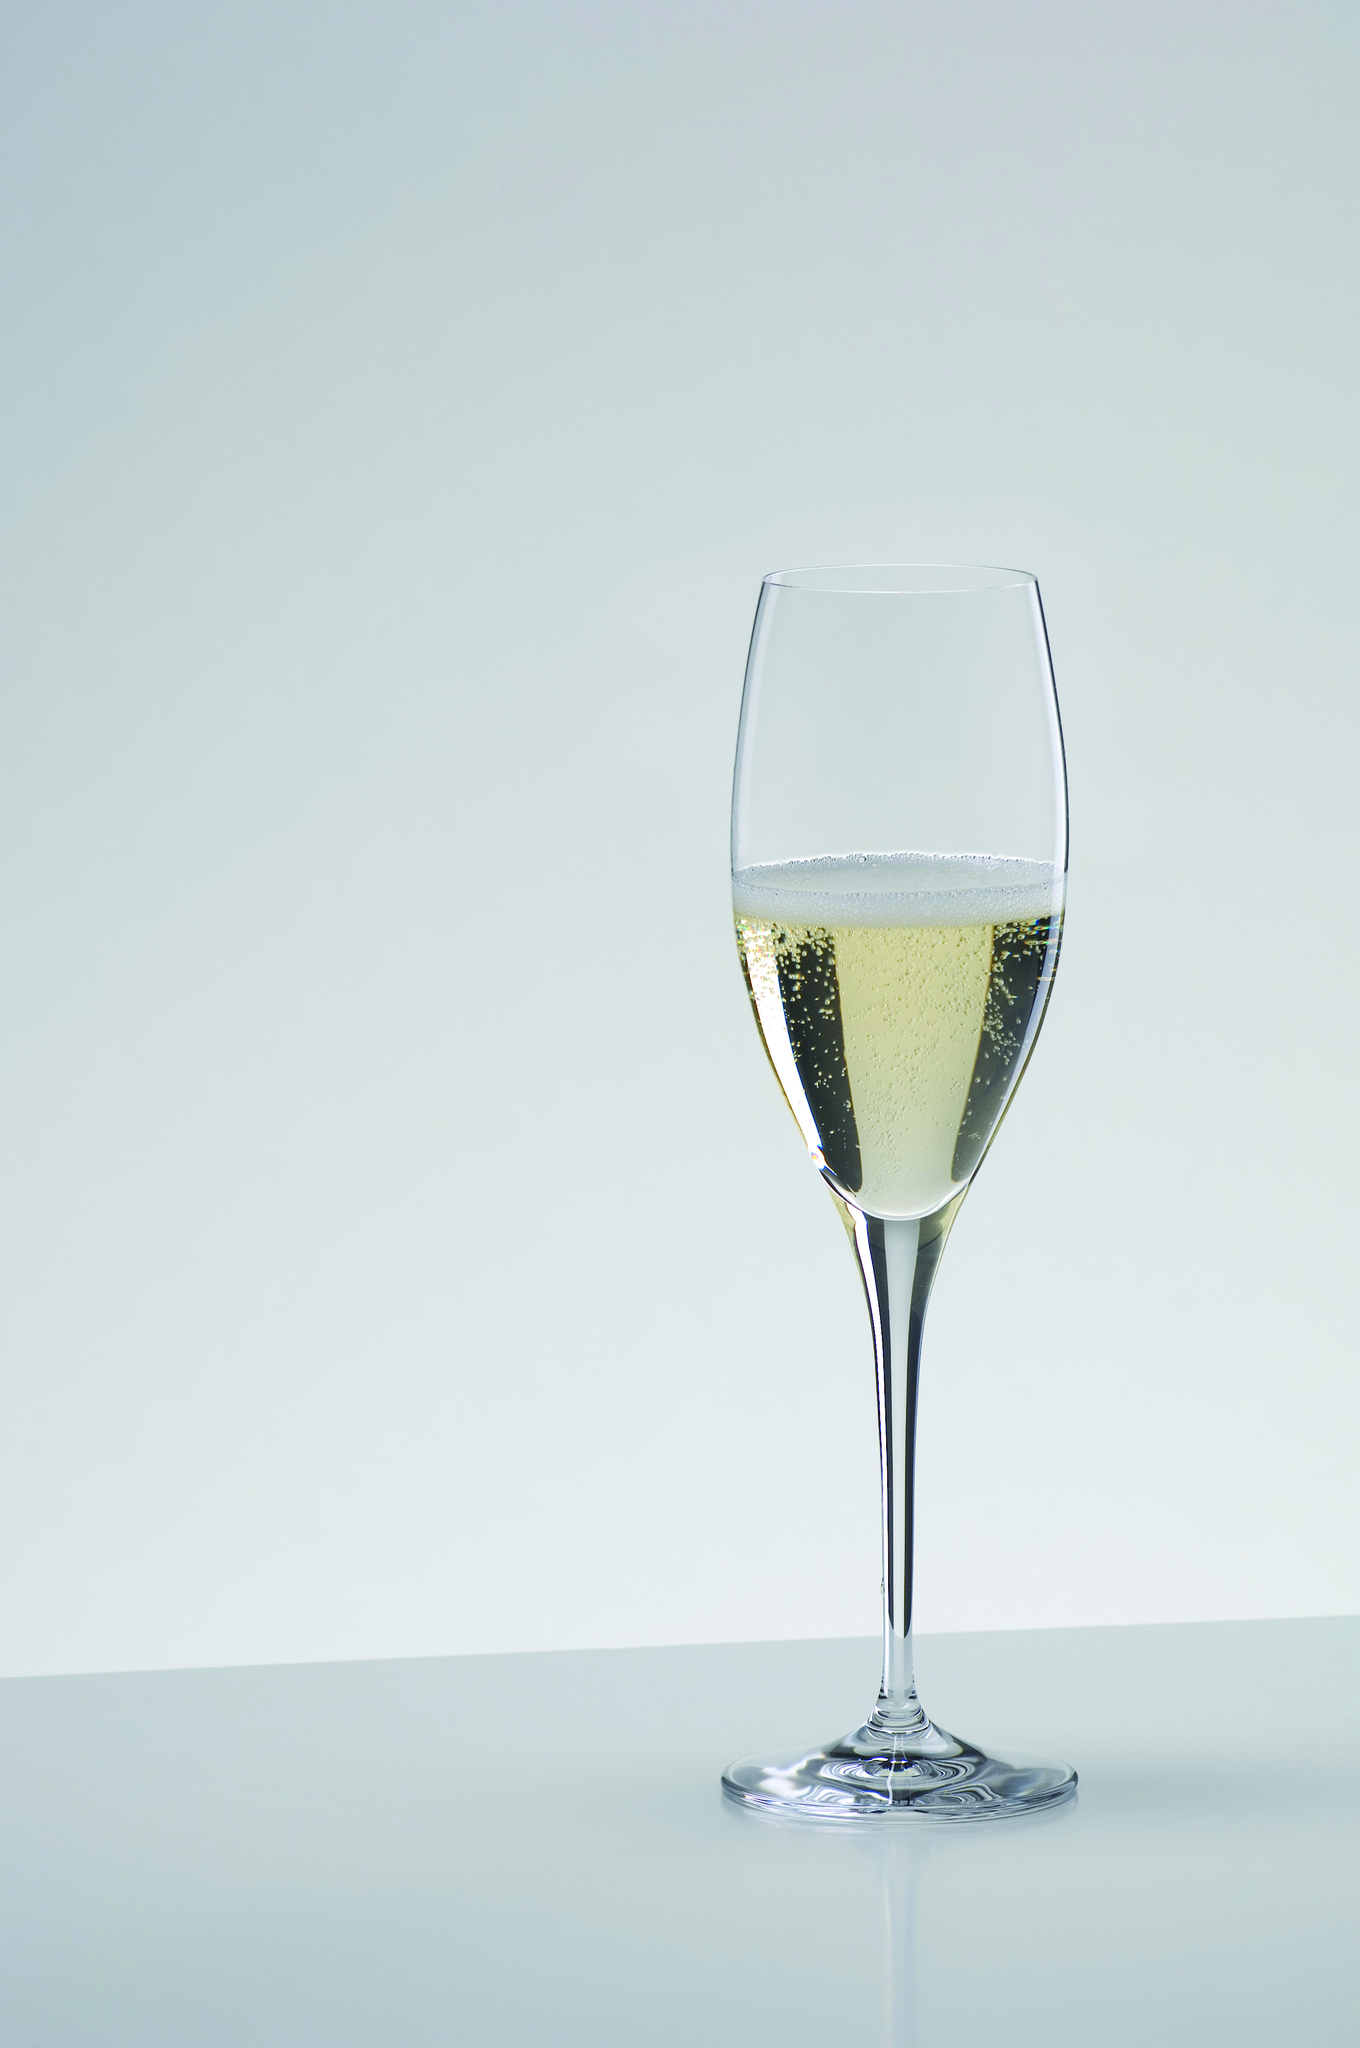 Бокалы Набор бокалов для шампанского 2 шт 330 мл Riedel Heart to Heart Champagne Glass nabor-bokalov-dlya-shampanskogo-2-sht-330-ml-riedel-heart-to-heart-champagne-glass-avstriya.jpg